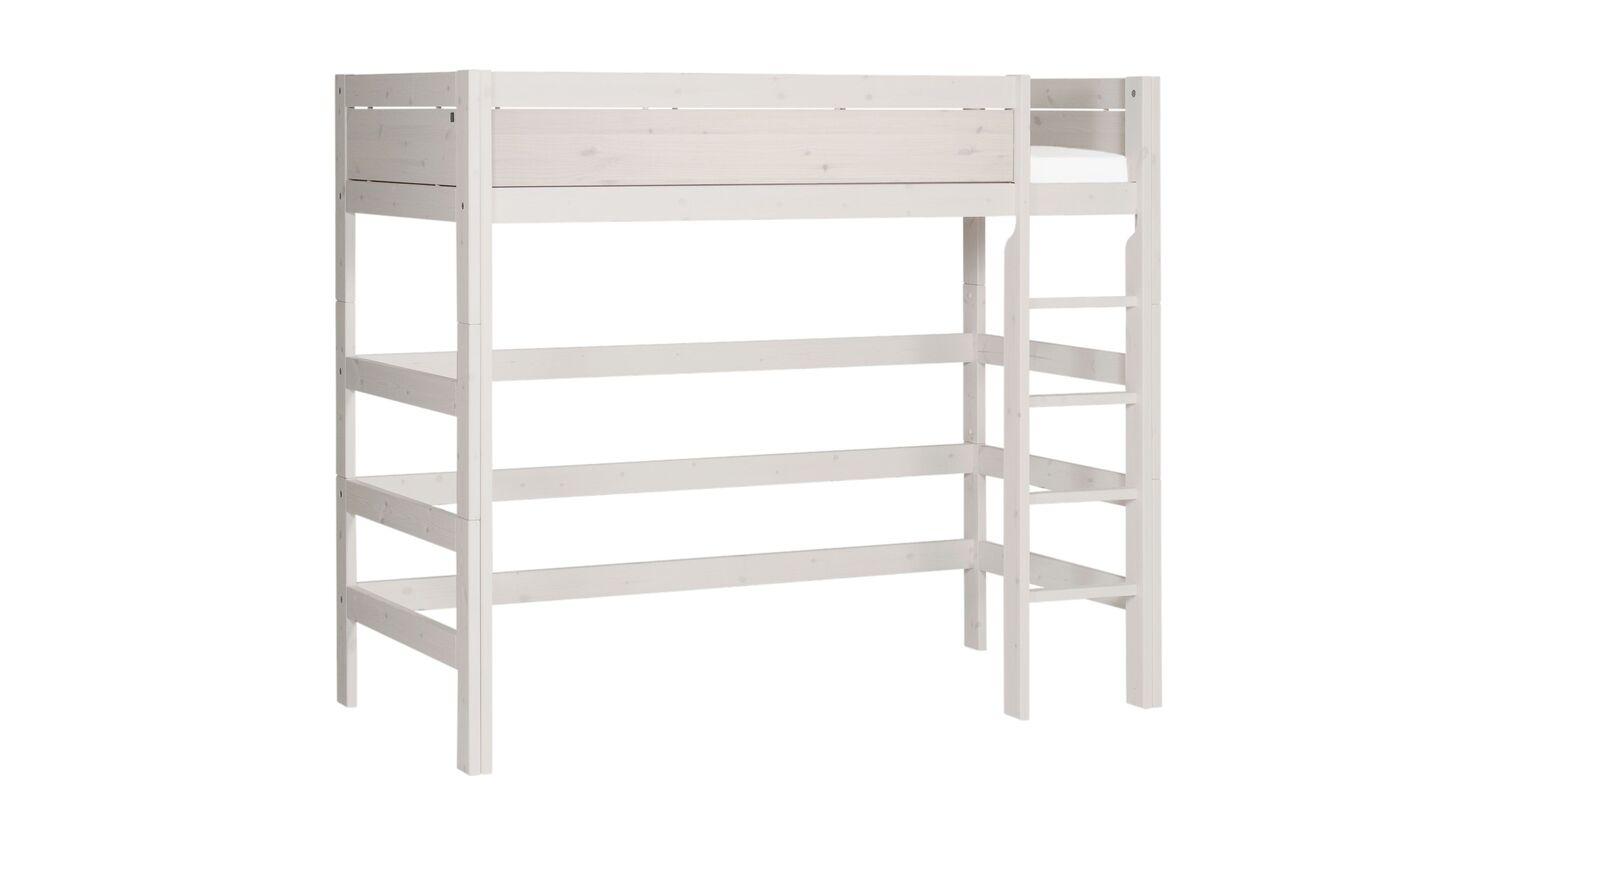 lifetime kinderhochbett aus massivholz in vielen farben. Black Bedroom Furniture Sets. Home Design Ideas